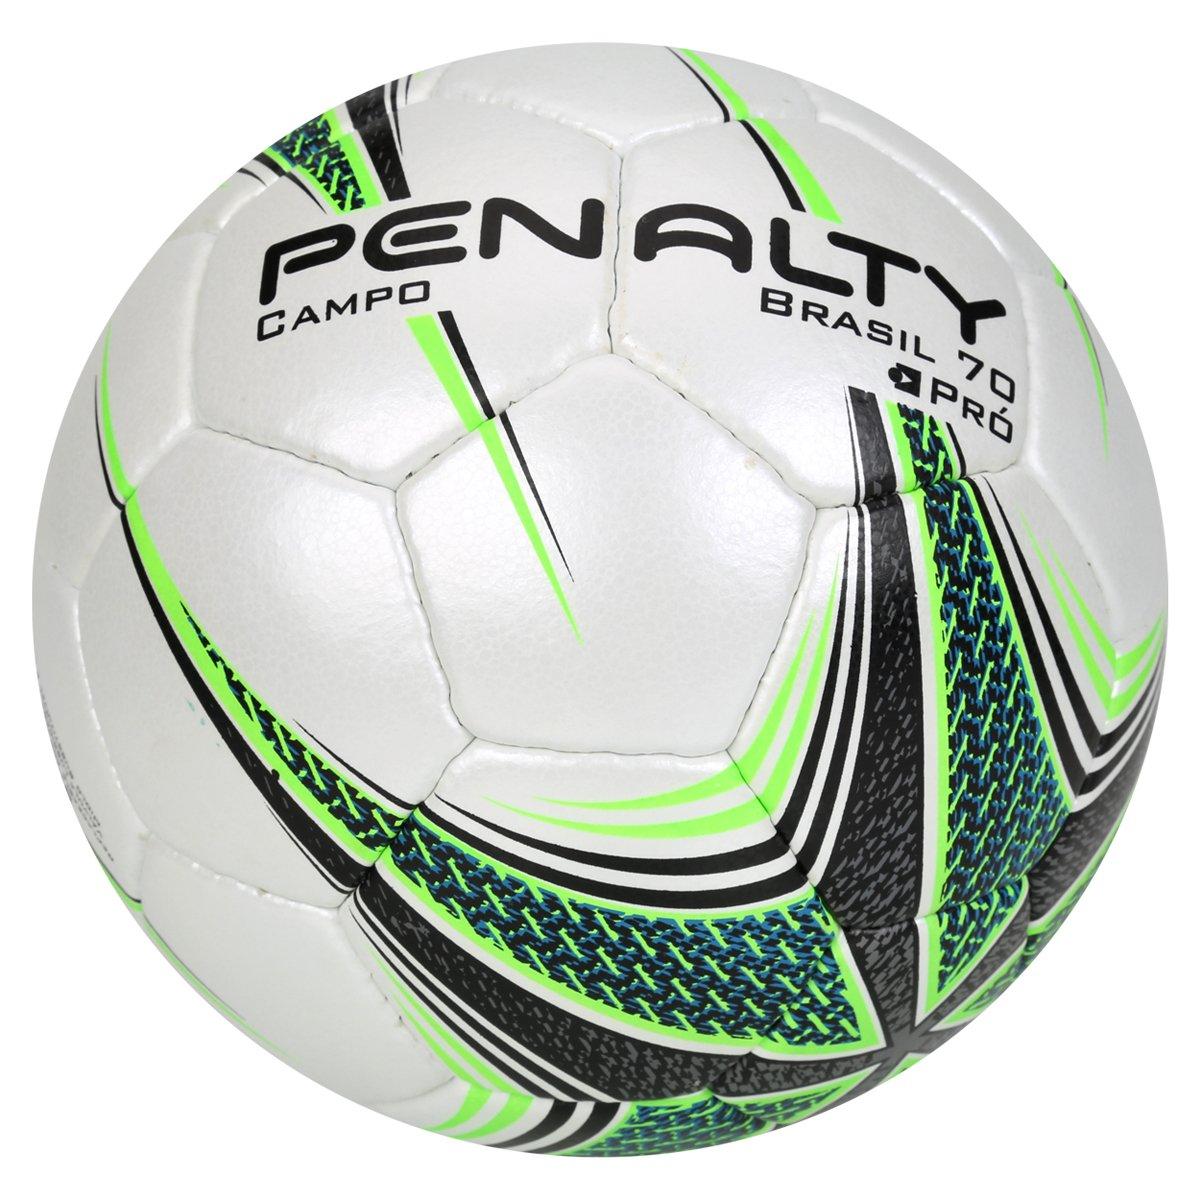 0adccad812 Bola Futebol Campo Penalty Brasil 70 Pro N4 6 - Compre Agora